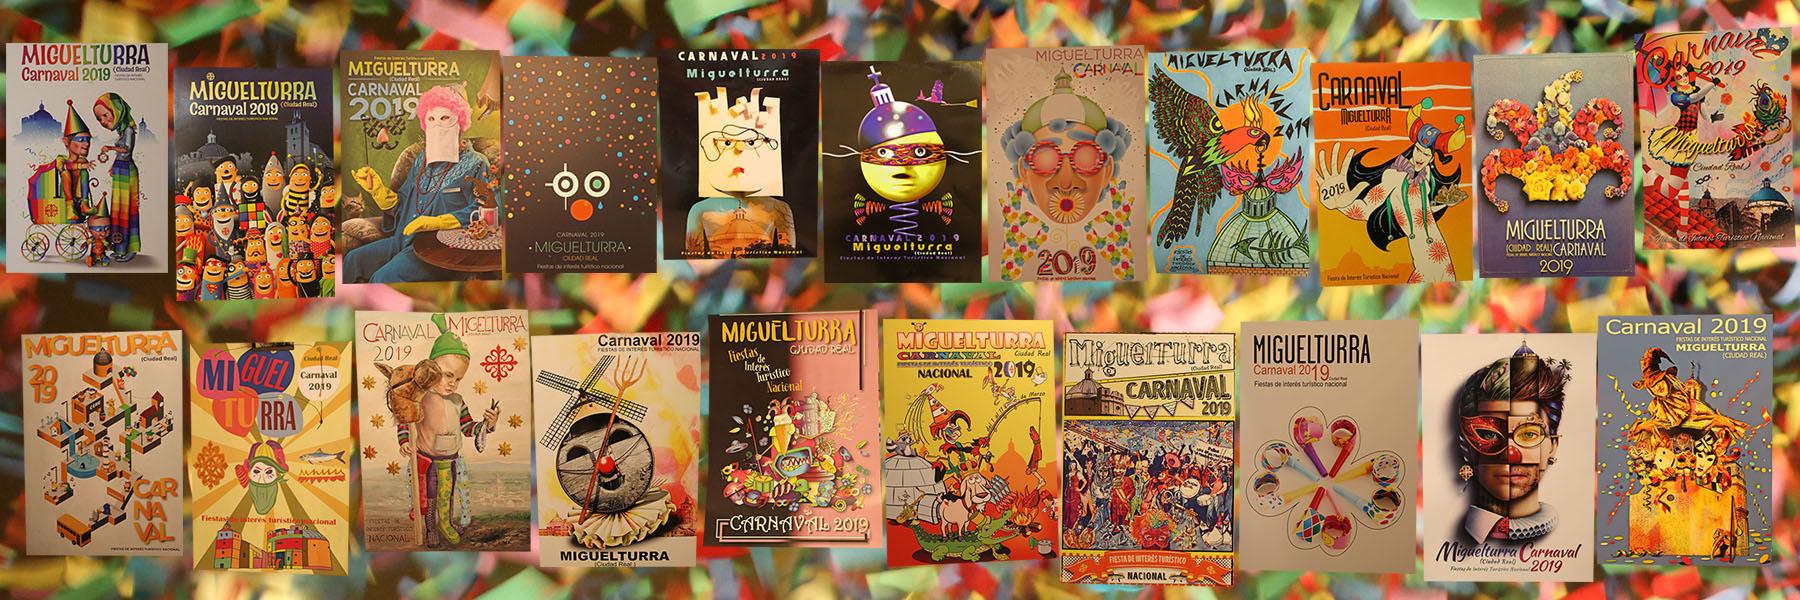 carnaval-miguelturra-carteles-2019